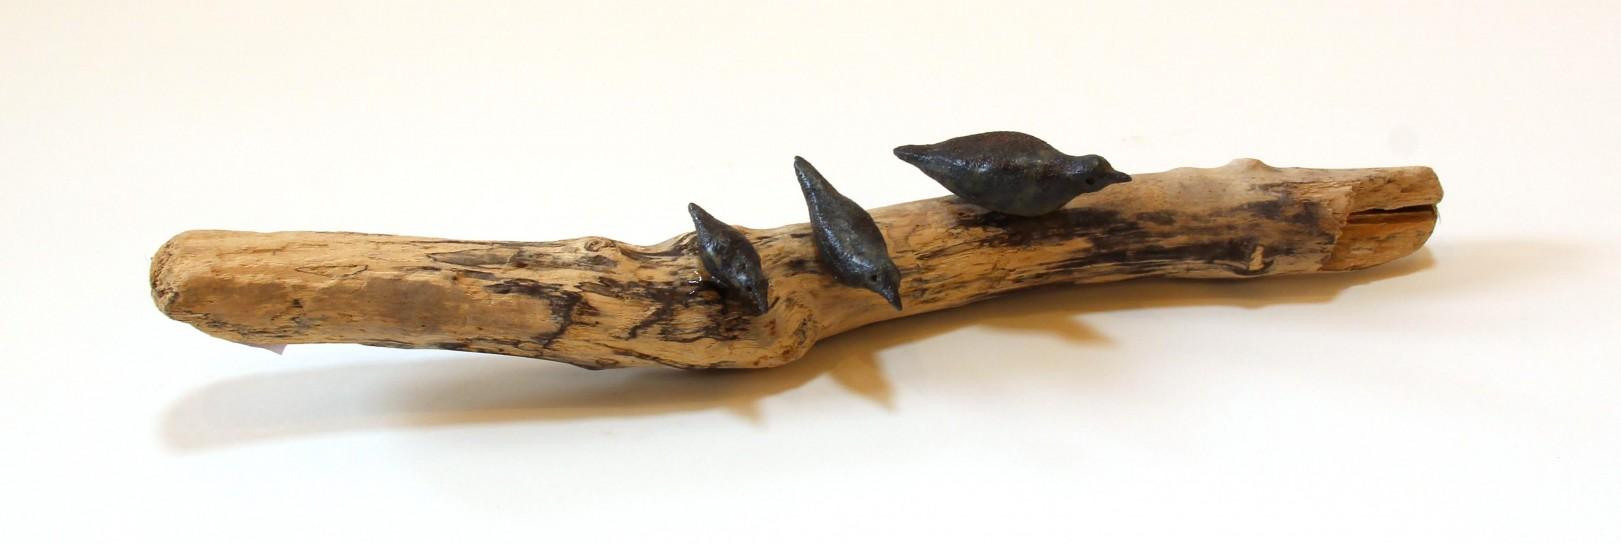 Jane Adams_Original_Ceramic on Driftwood_3 Birds on a Branch_17x3x3 (2)